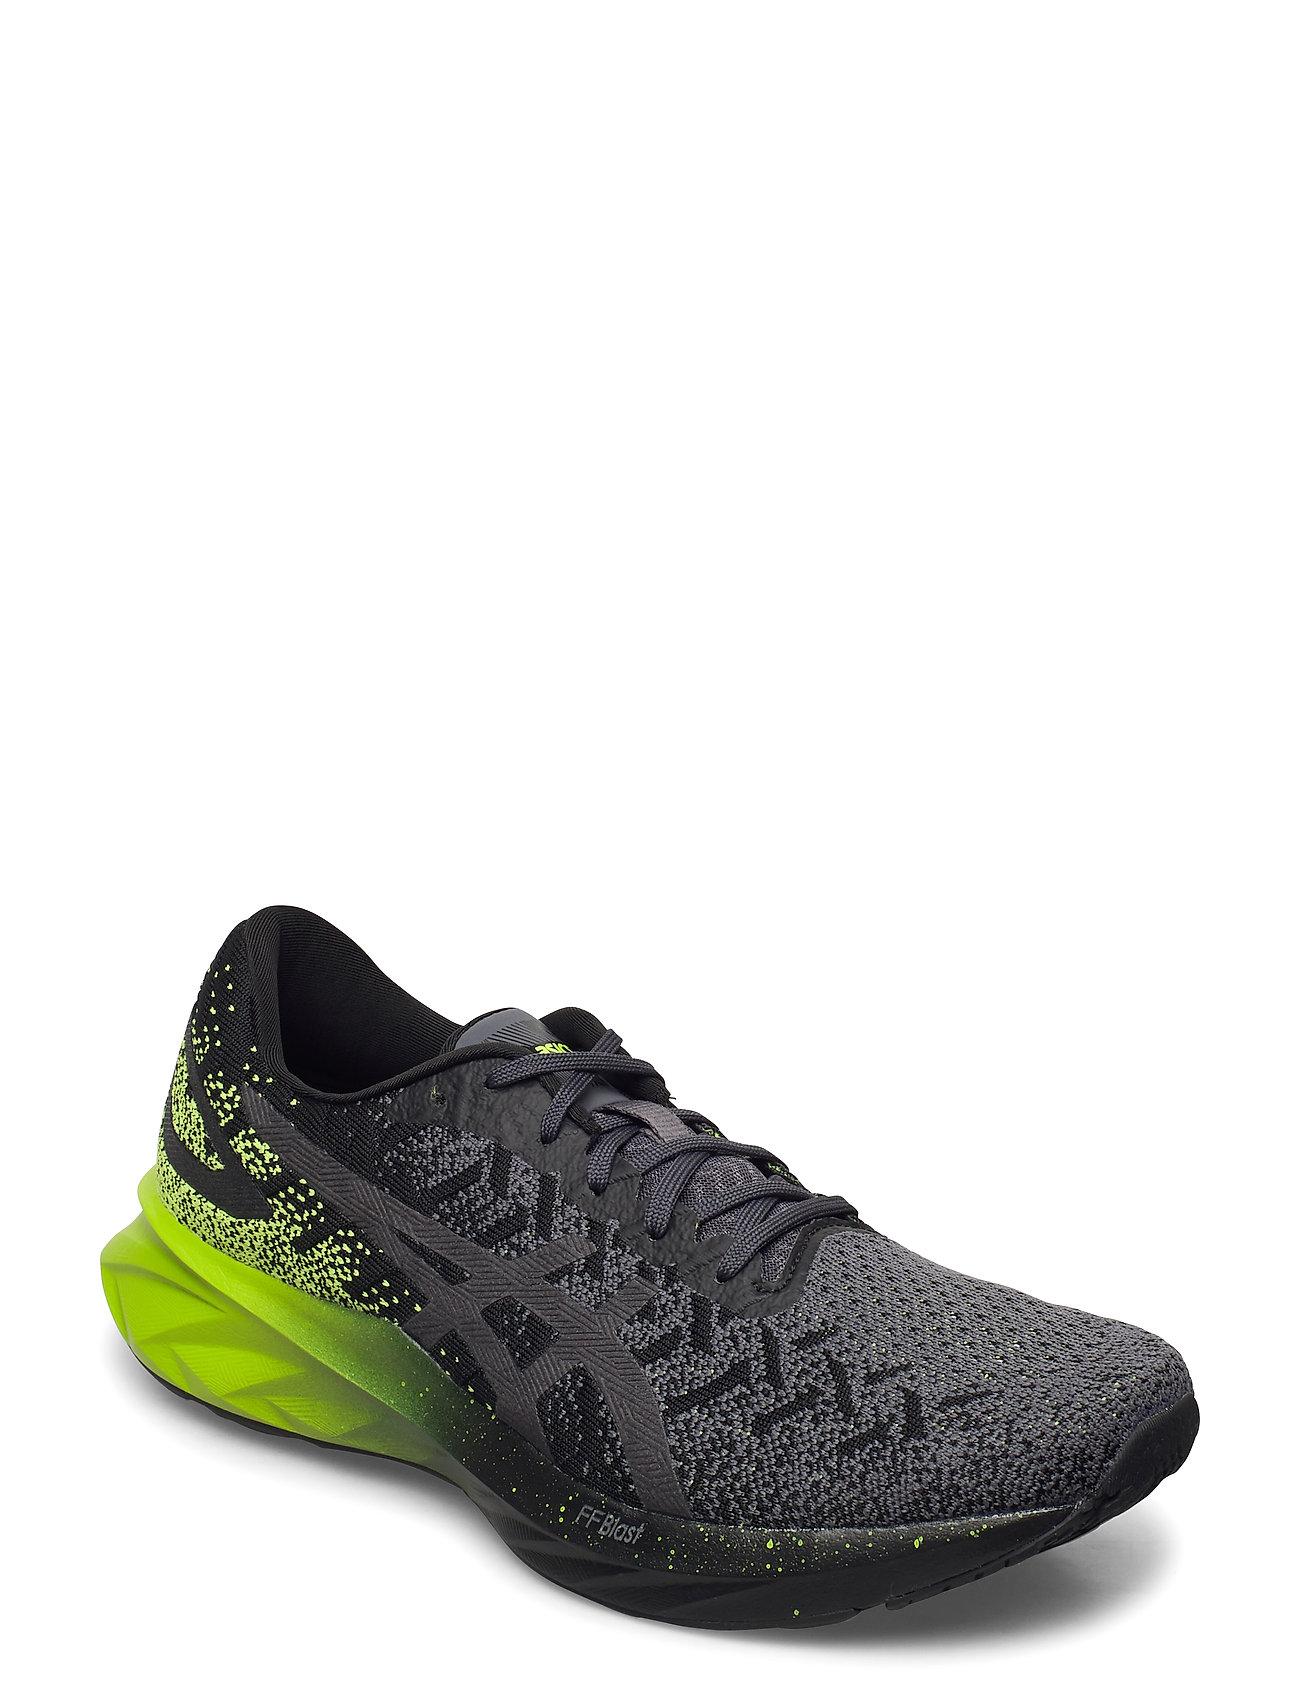 ASICS Sneaker | Dynablast Shoes Sport Shoes Running Shoes Schwarz ASICS